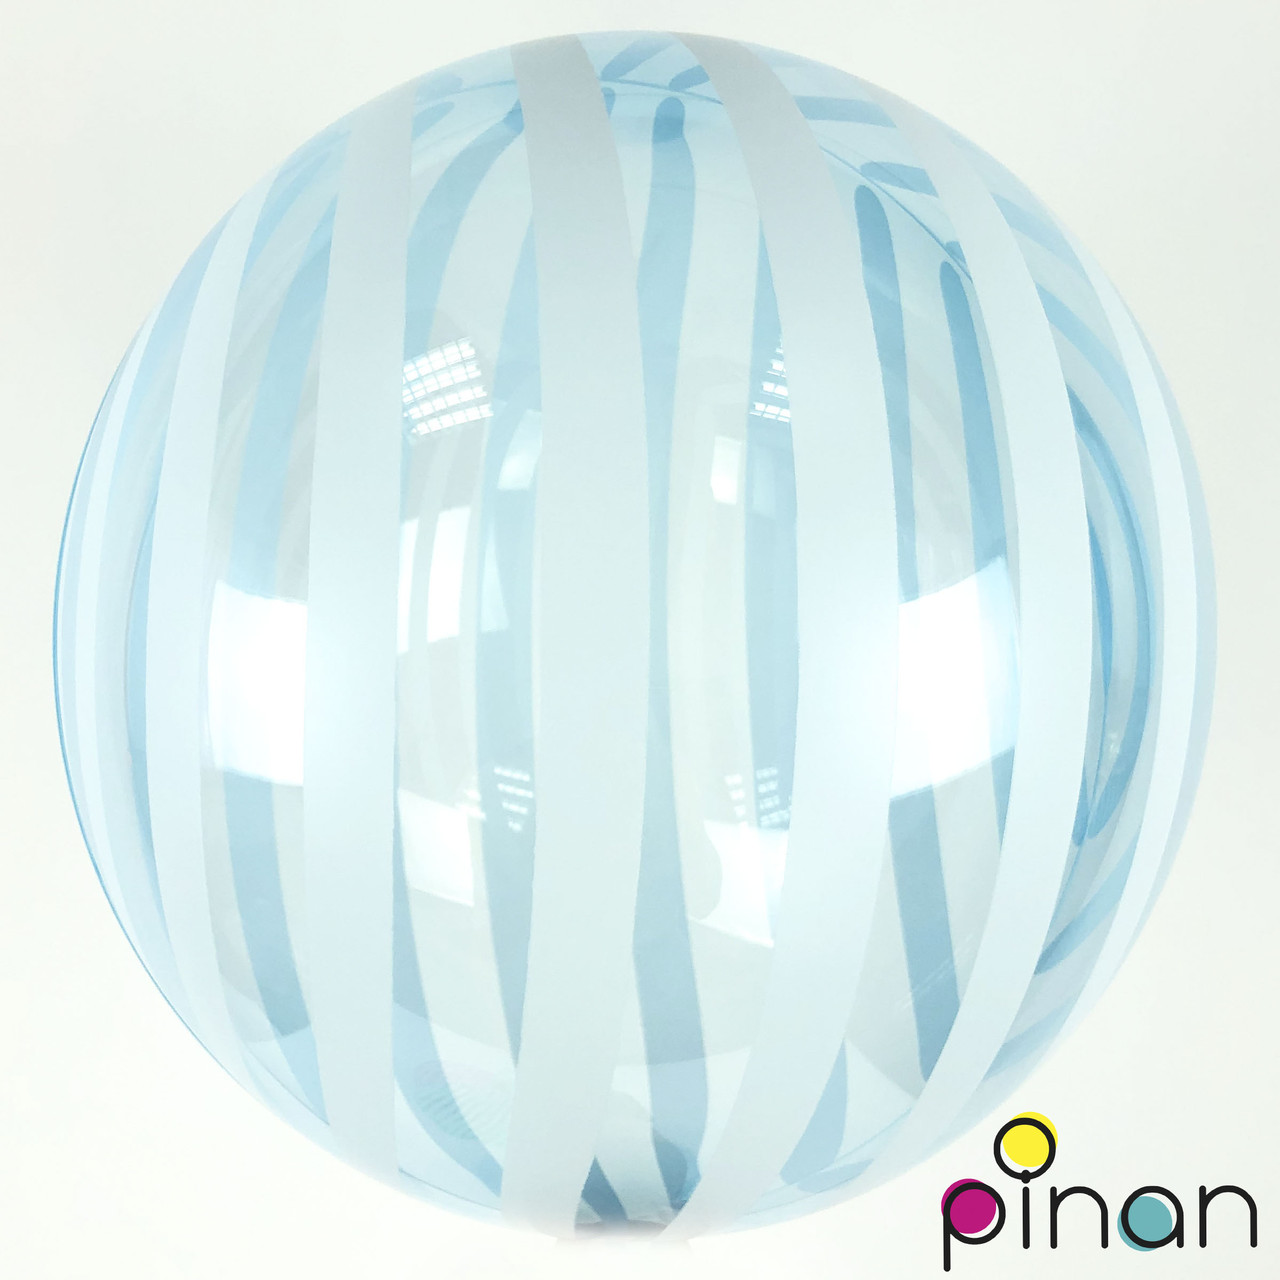 "Шар Bubbles голубой с полосками кристалл, Pinan 45 см (18"")"